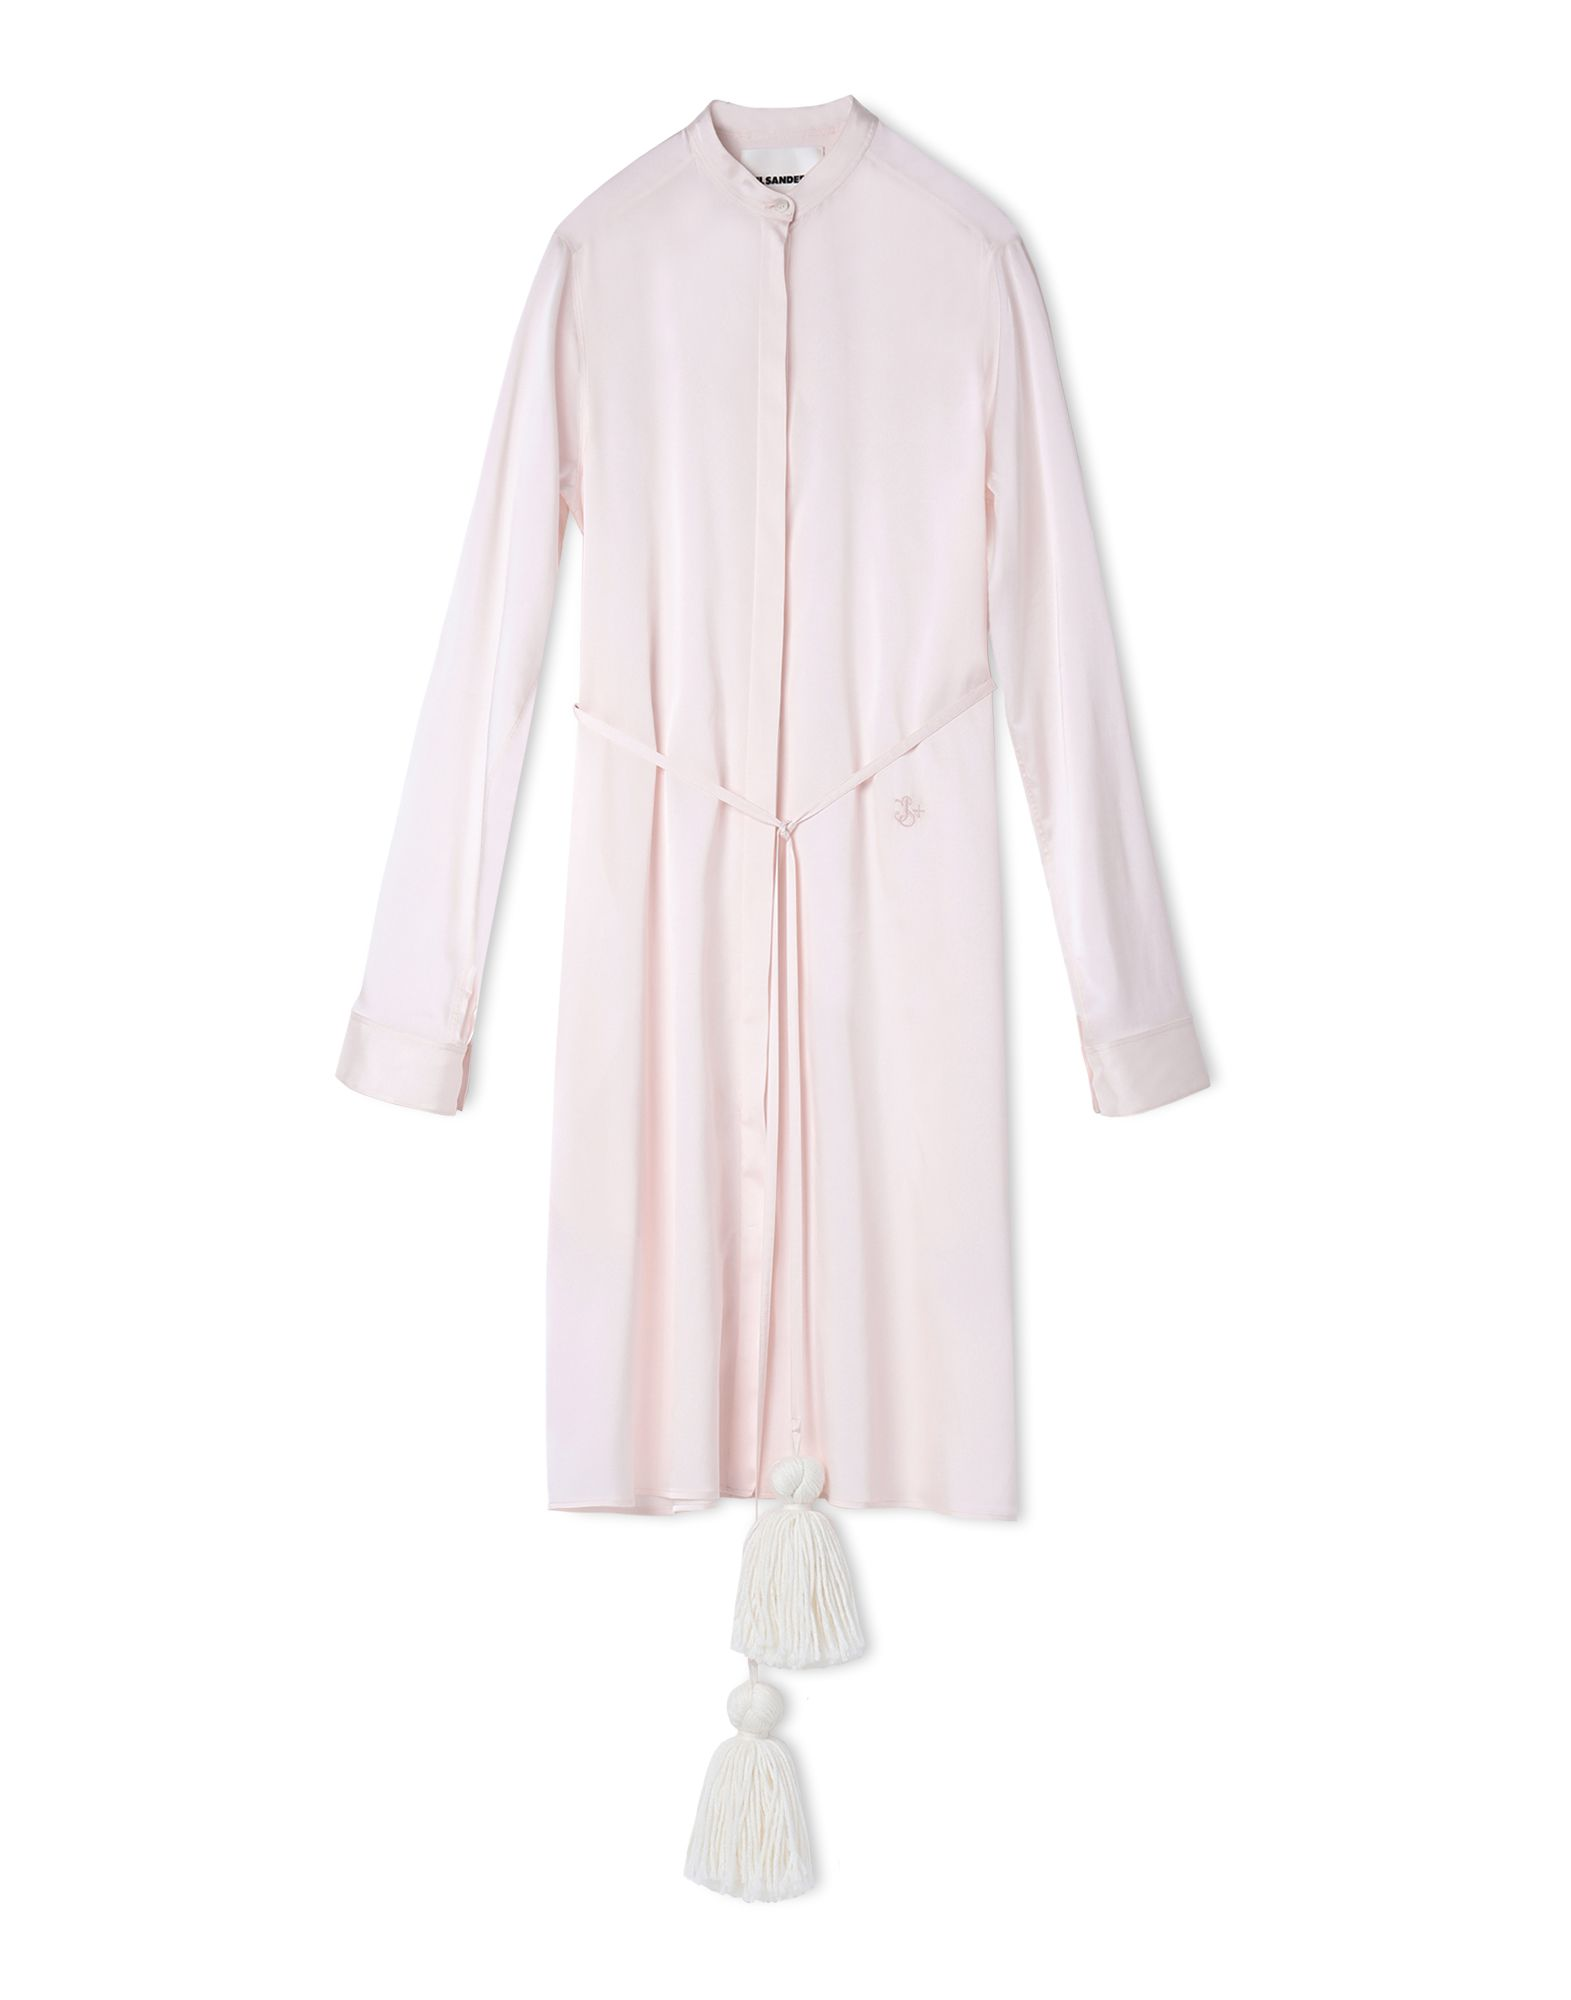 Nightgowns - JIL SANDER+ Online Store